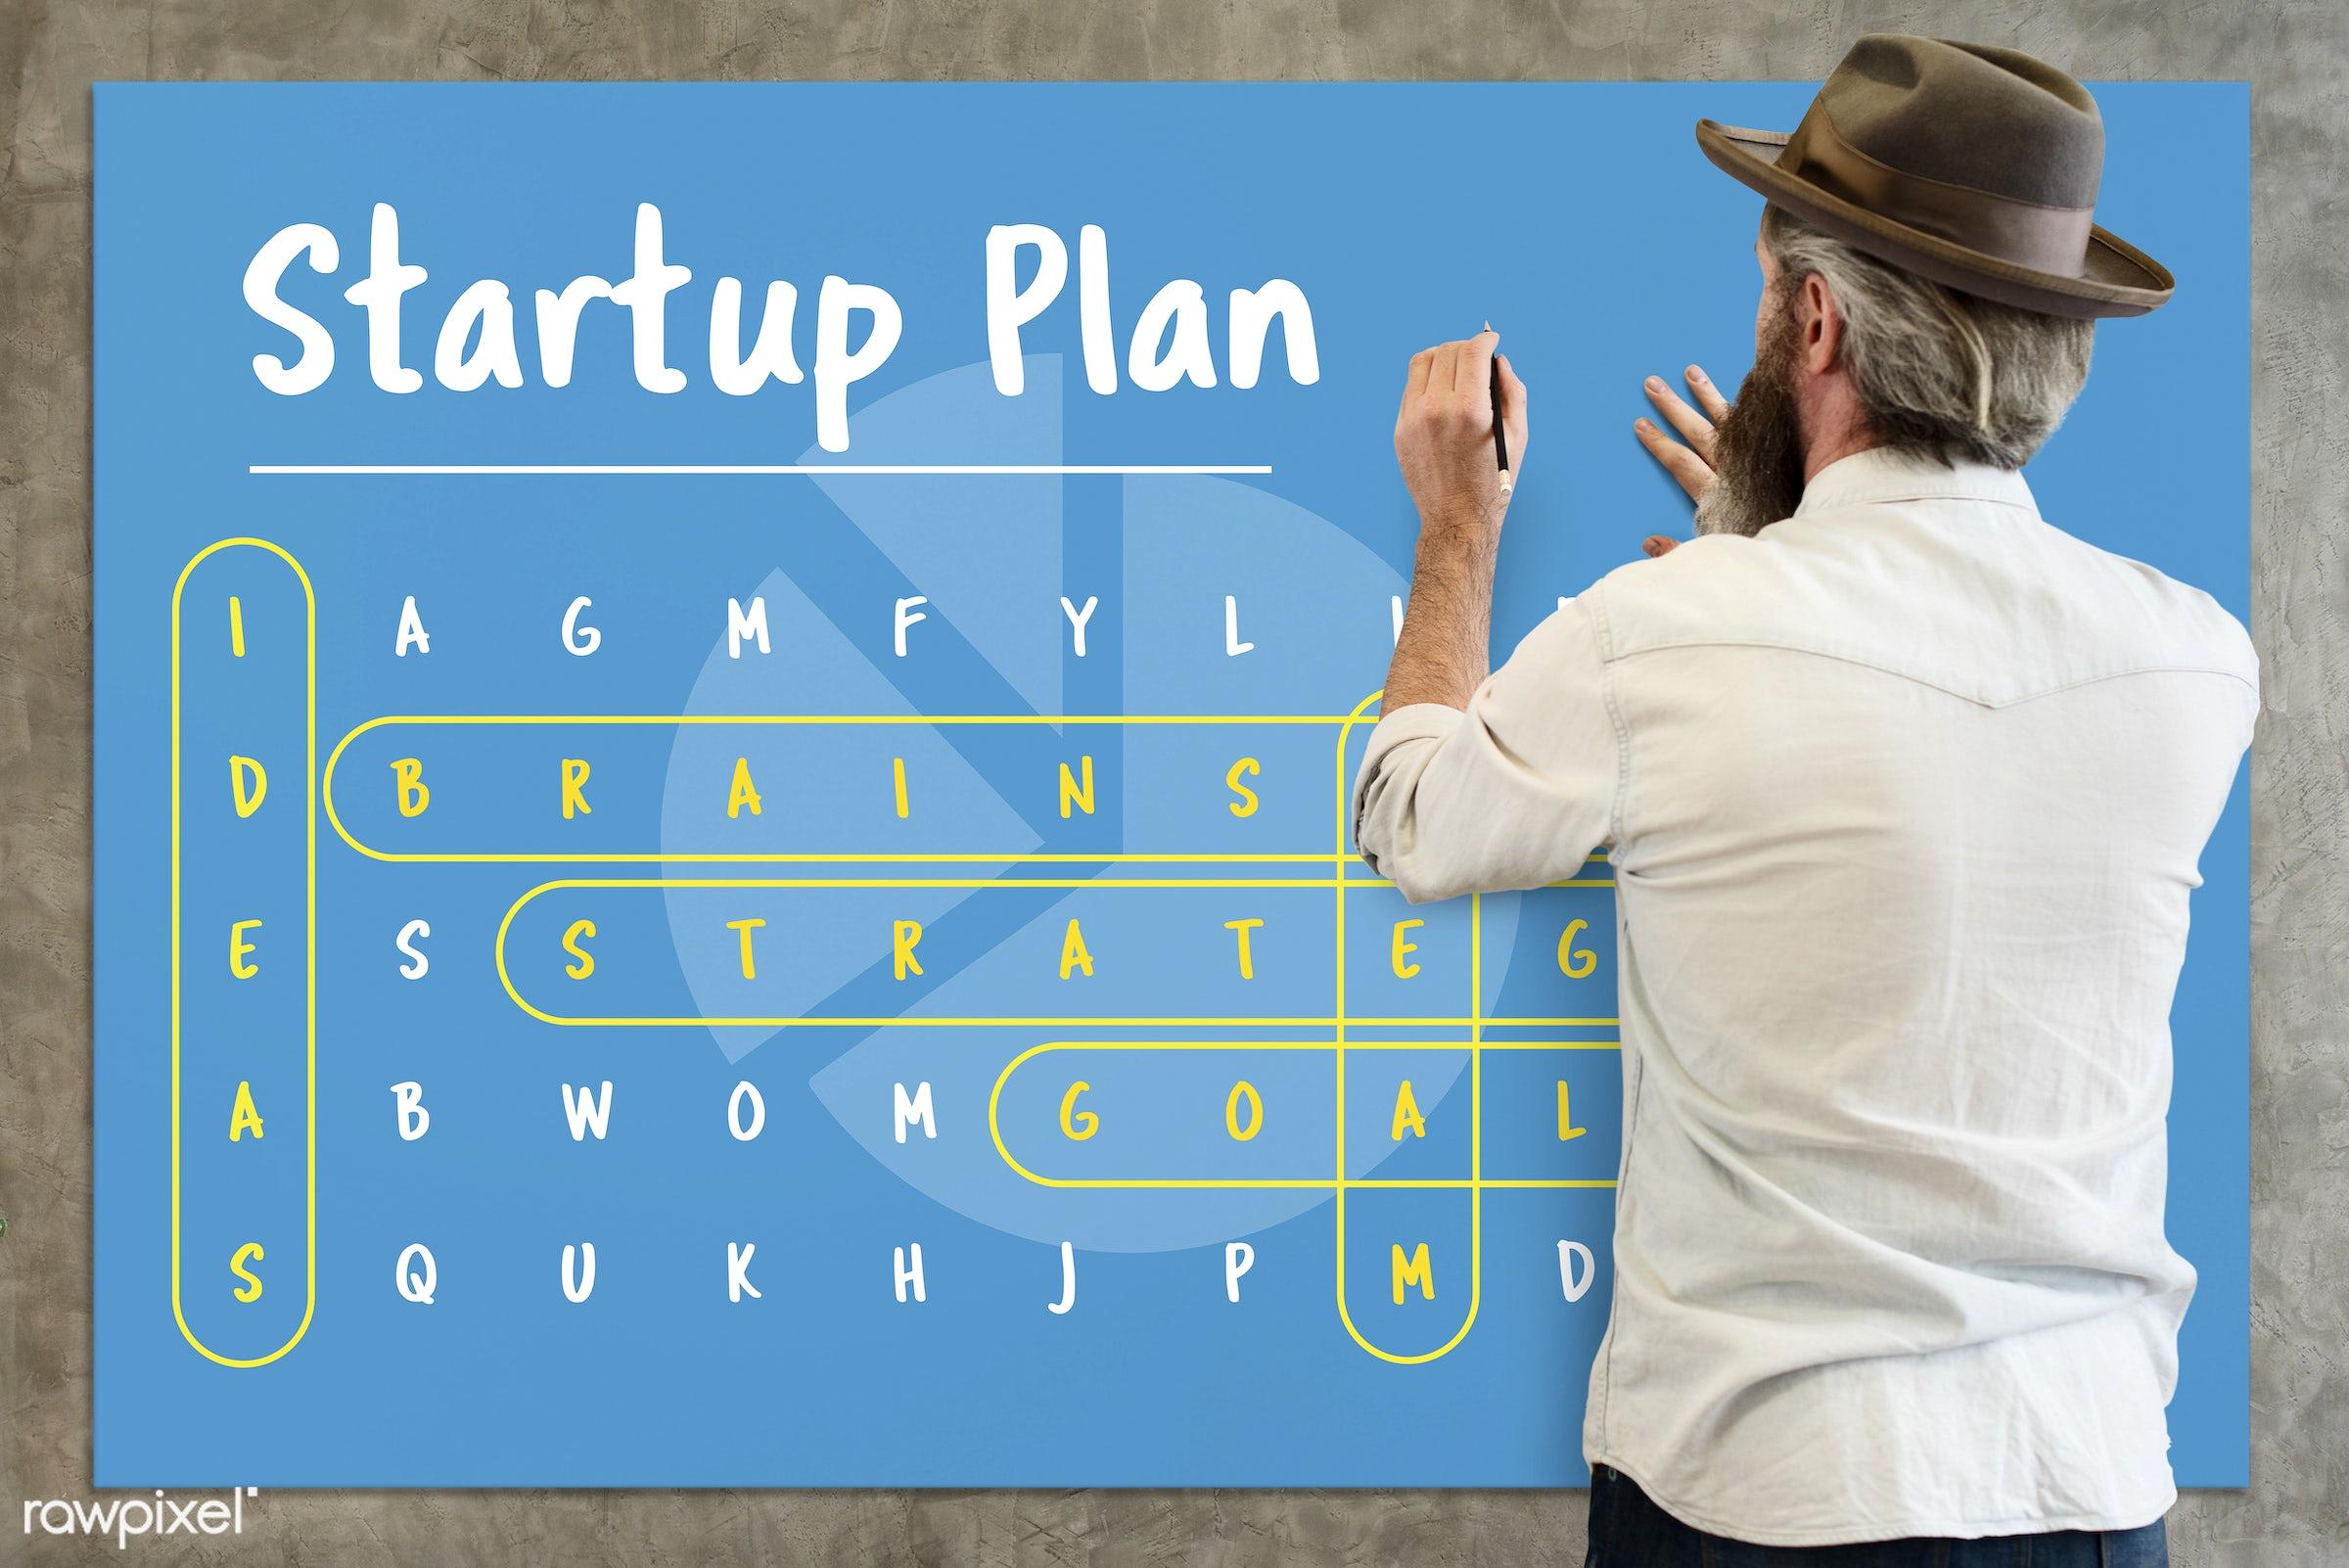 adult, alone, back, be creative, beard, beard guy, board, brainstorm, business, business plan, carefree, casual, challenge,...